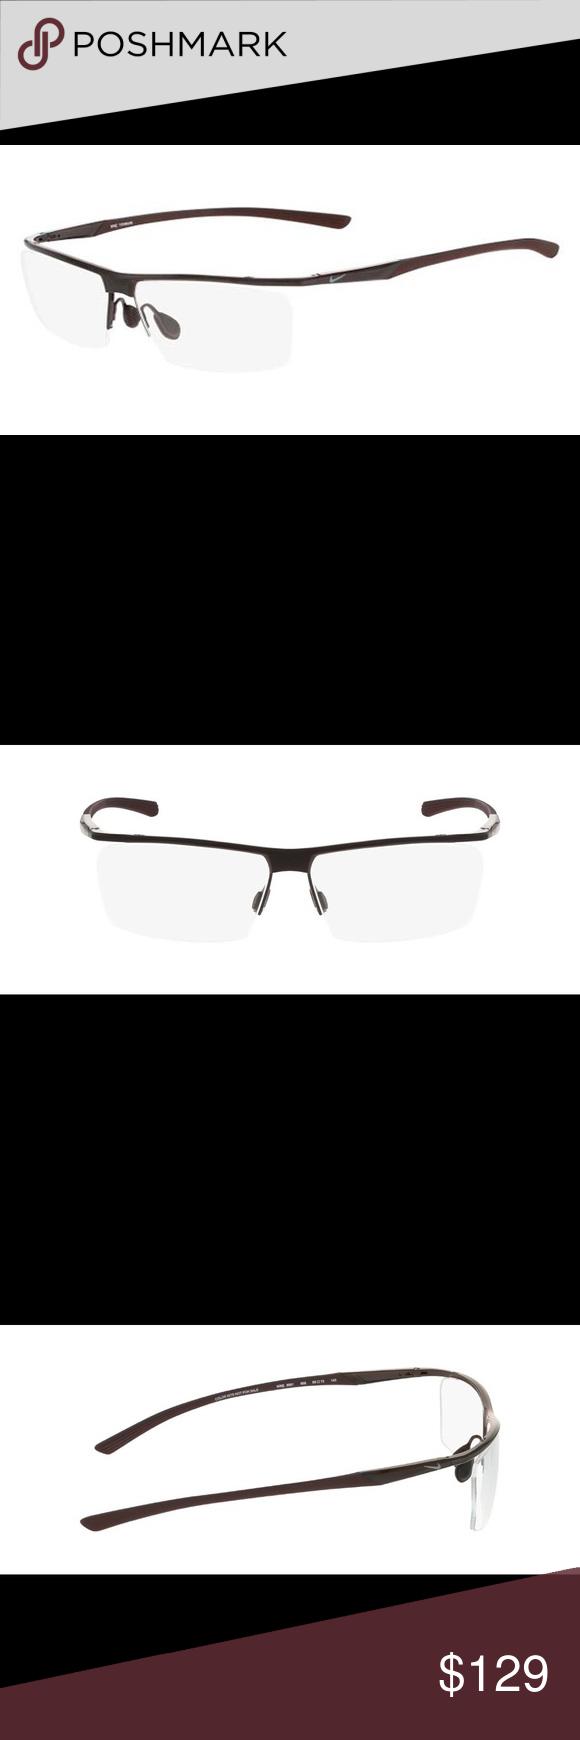 Nike Eyeglass Frames 6061 Gunmetal Deep Burgundy Boutique